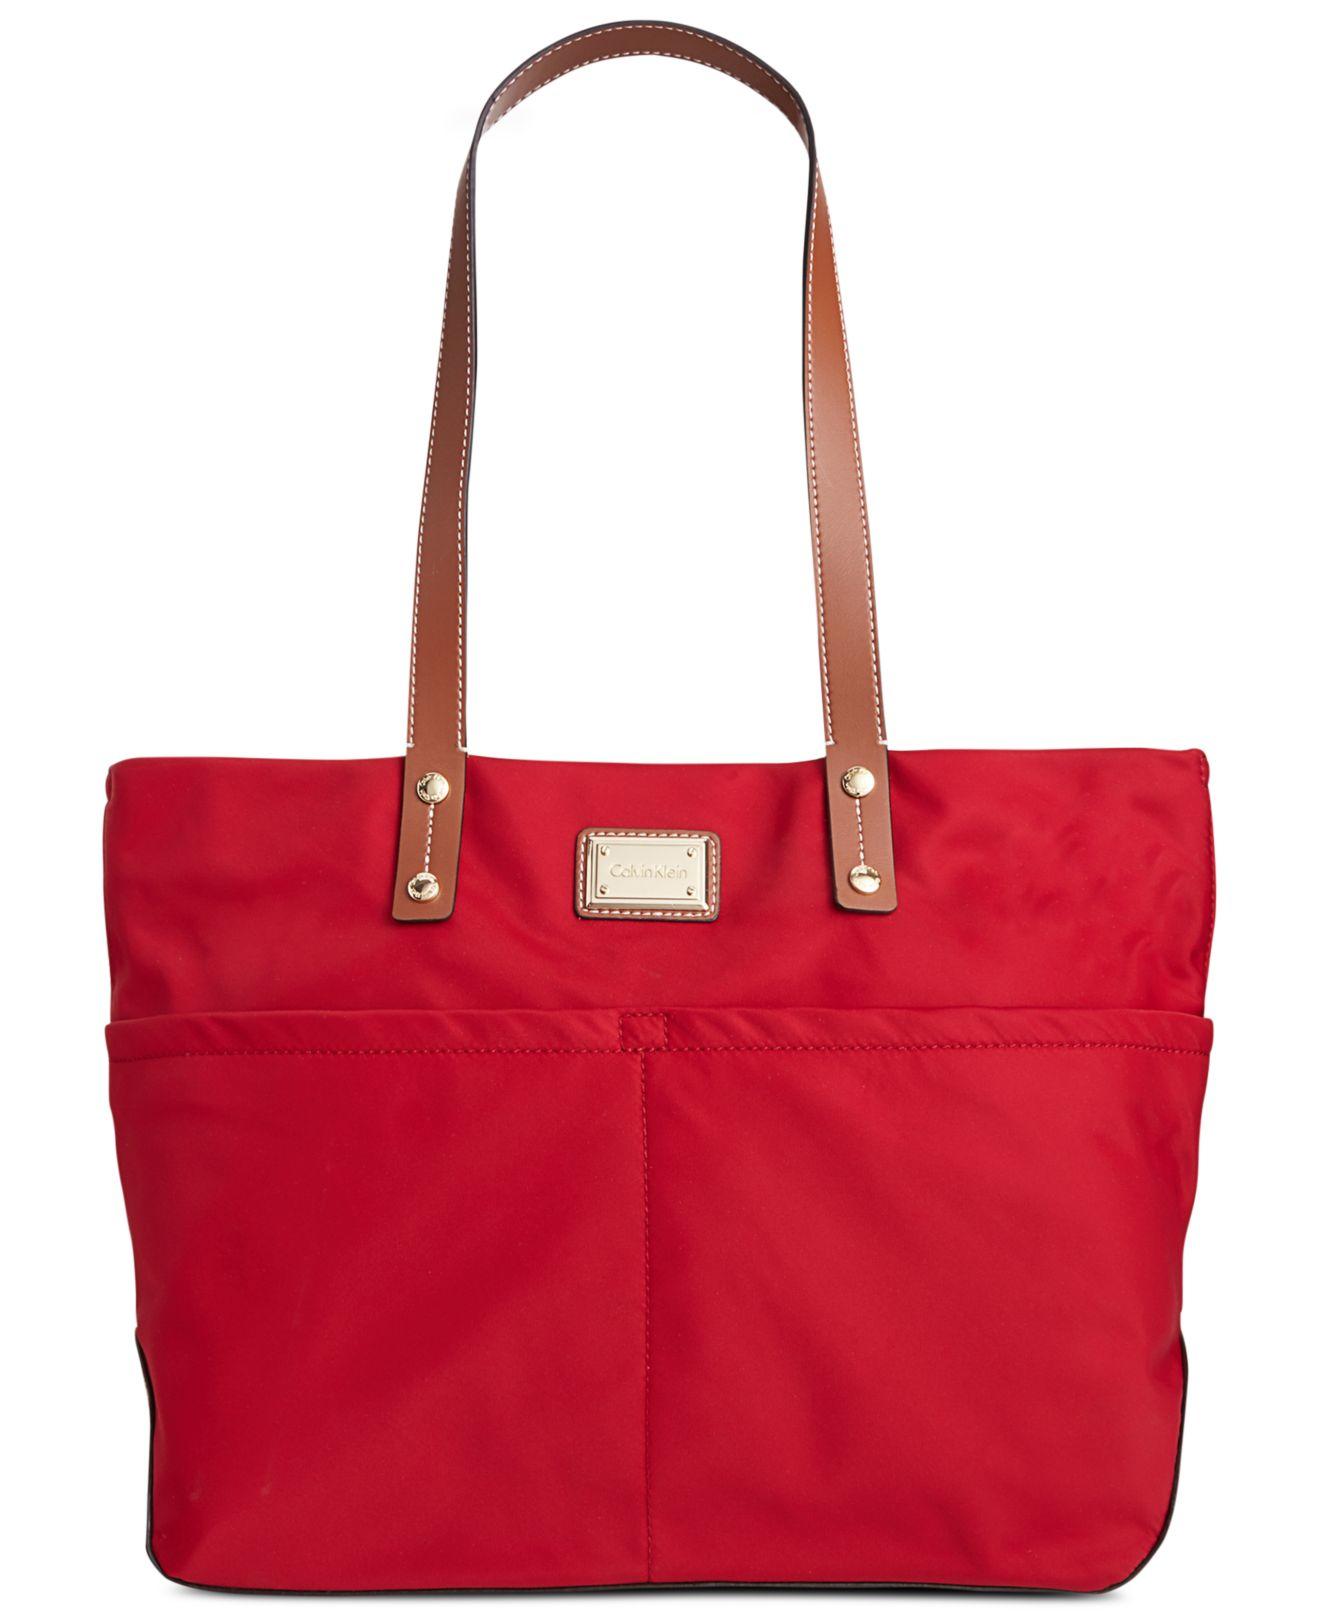 05708f6ac Calvin Klein Dressy Nylon Tote in Red - Lyst